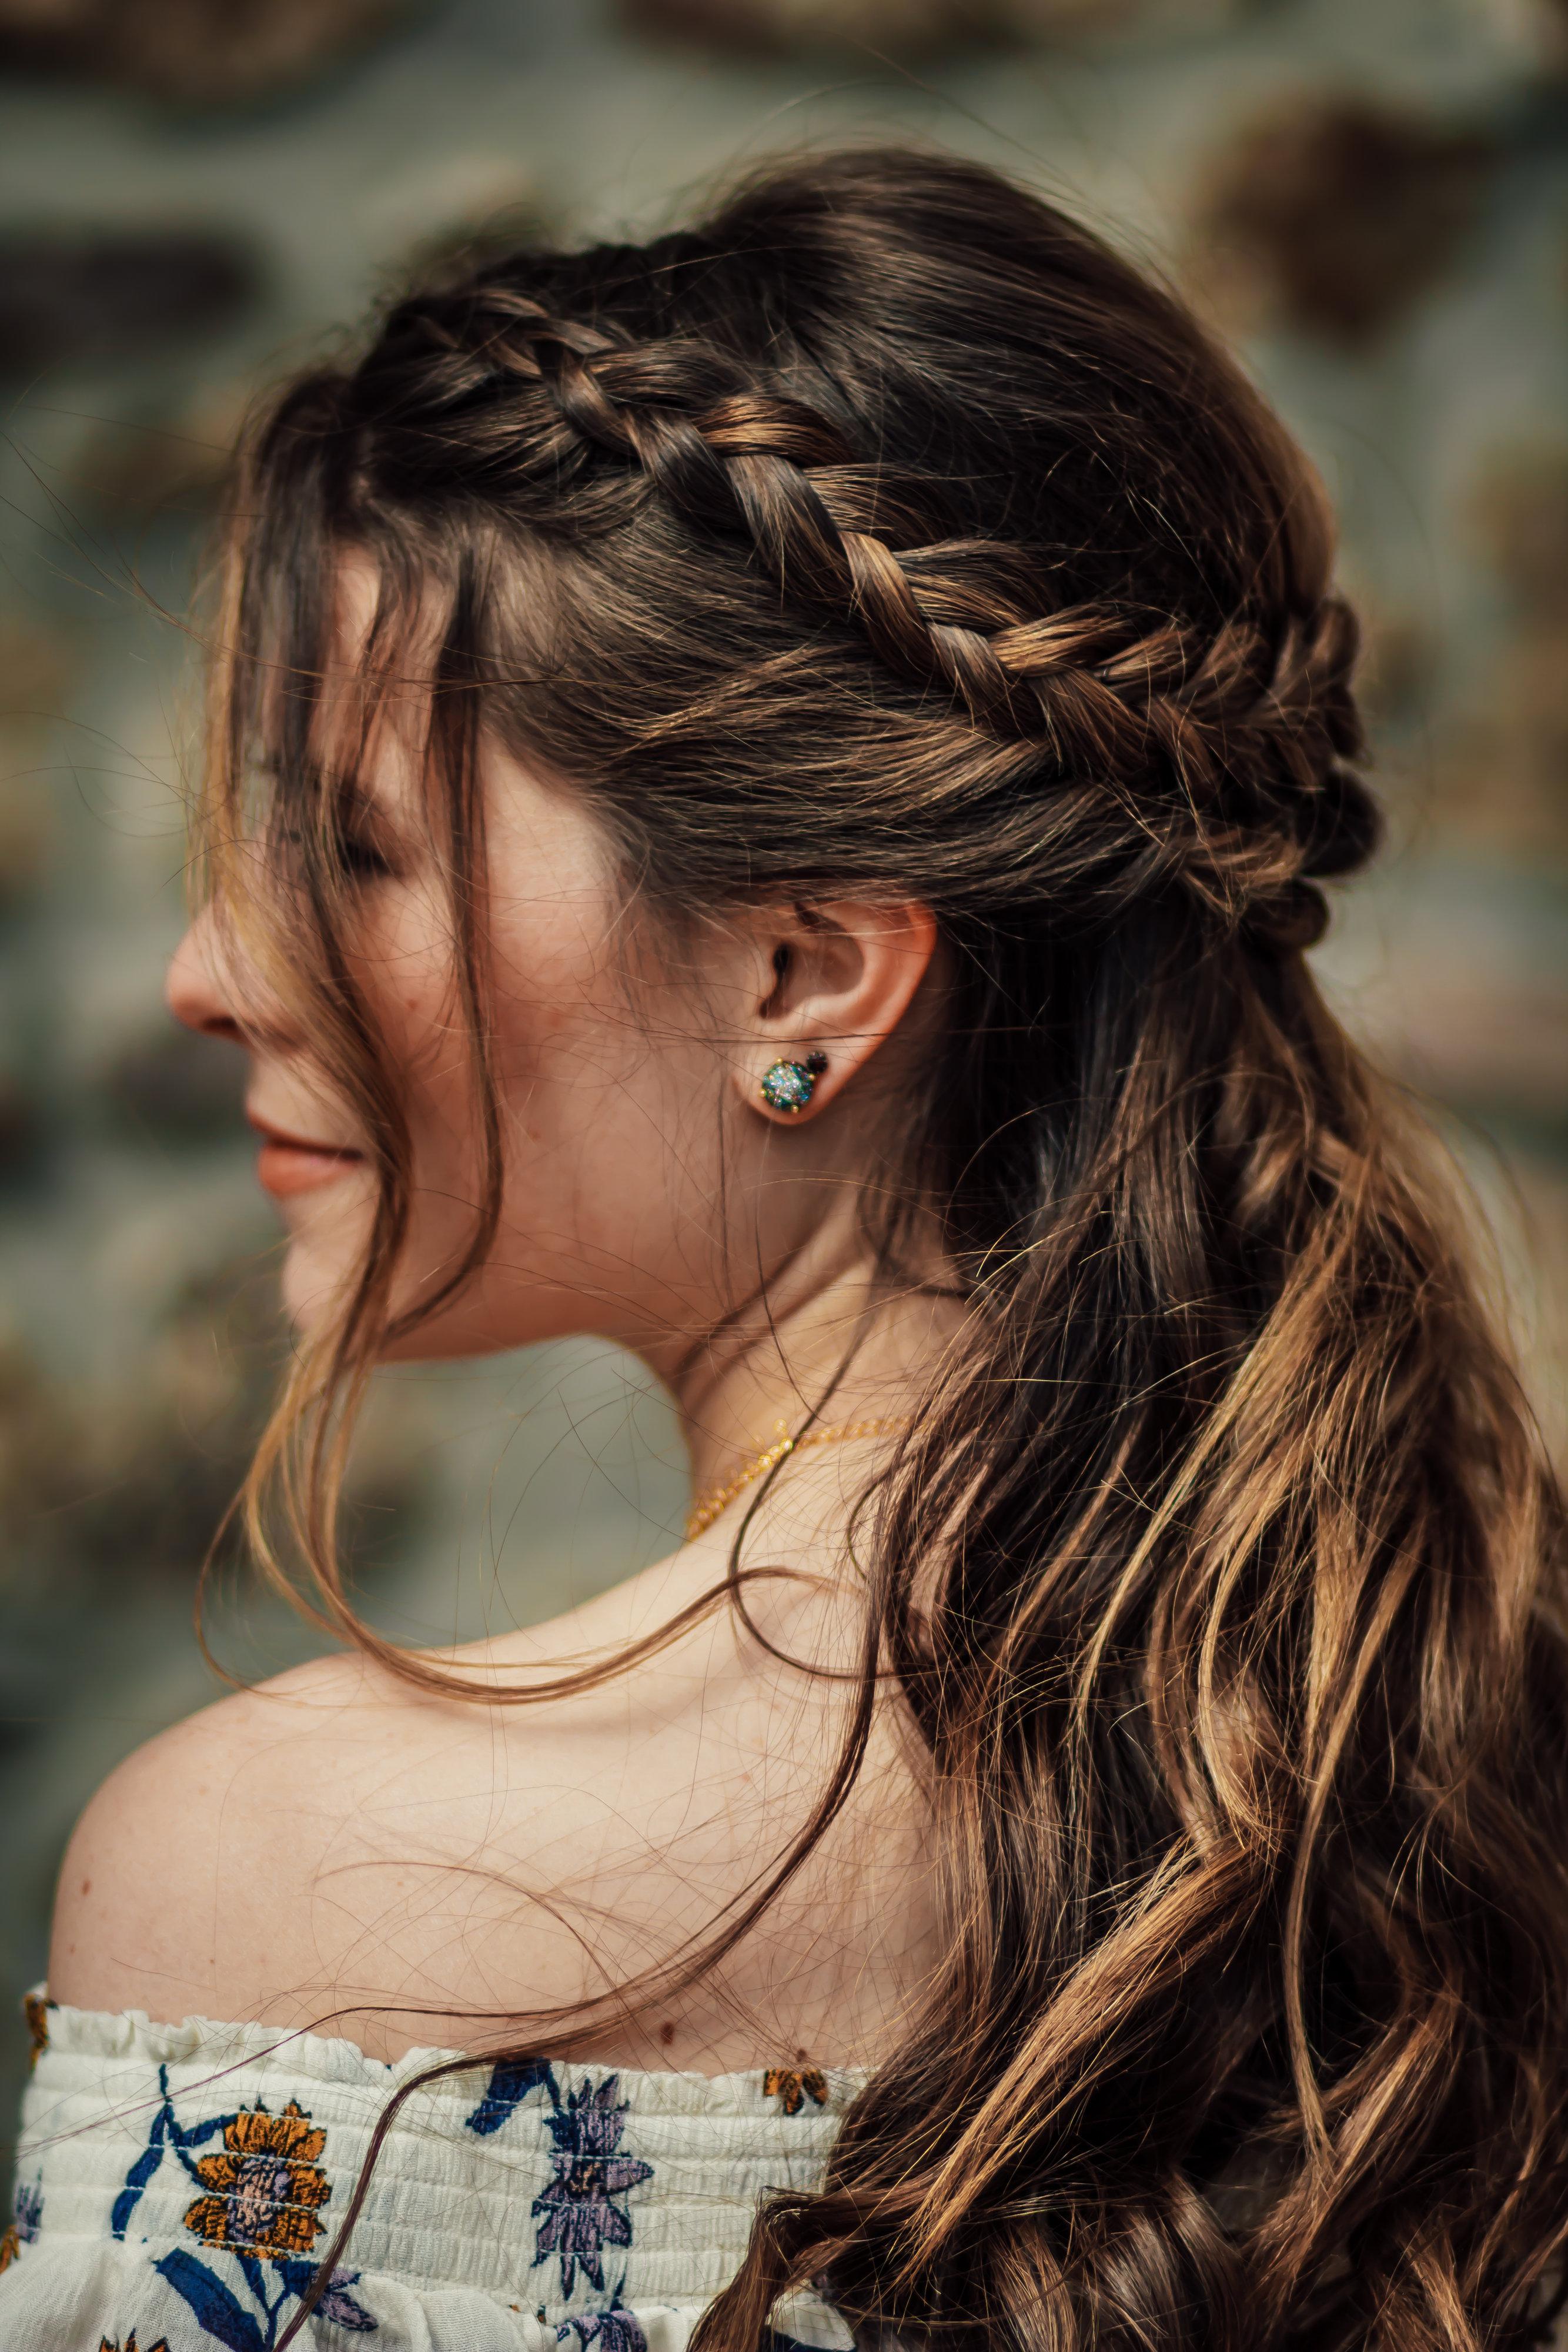 Elegantly braided crown on long brown hair by Indigo Collective hair stylist team near Clinton